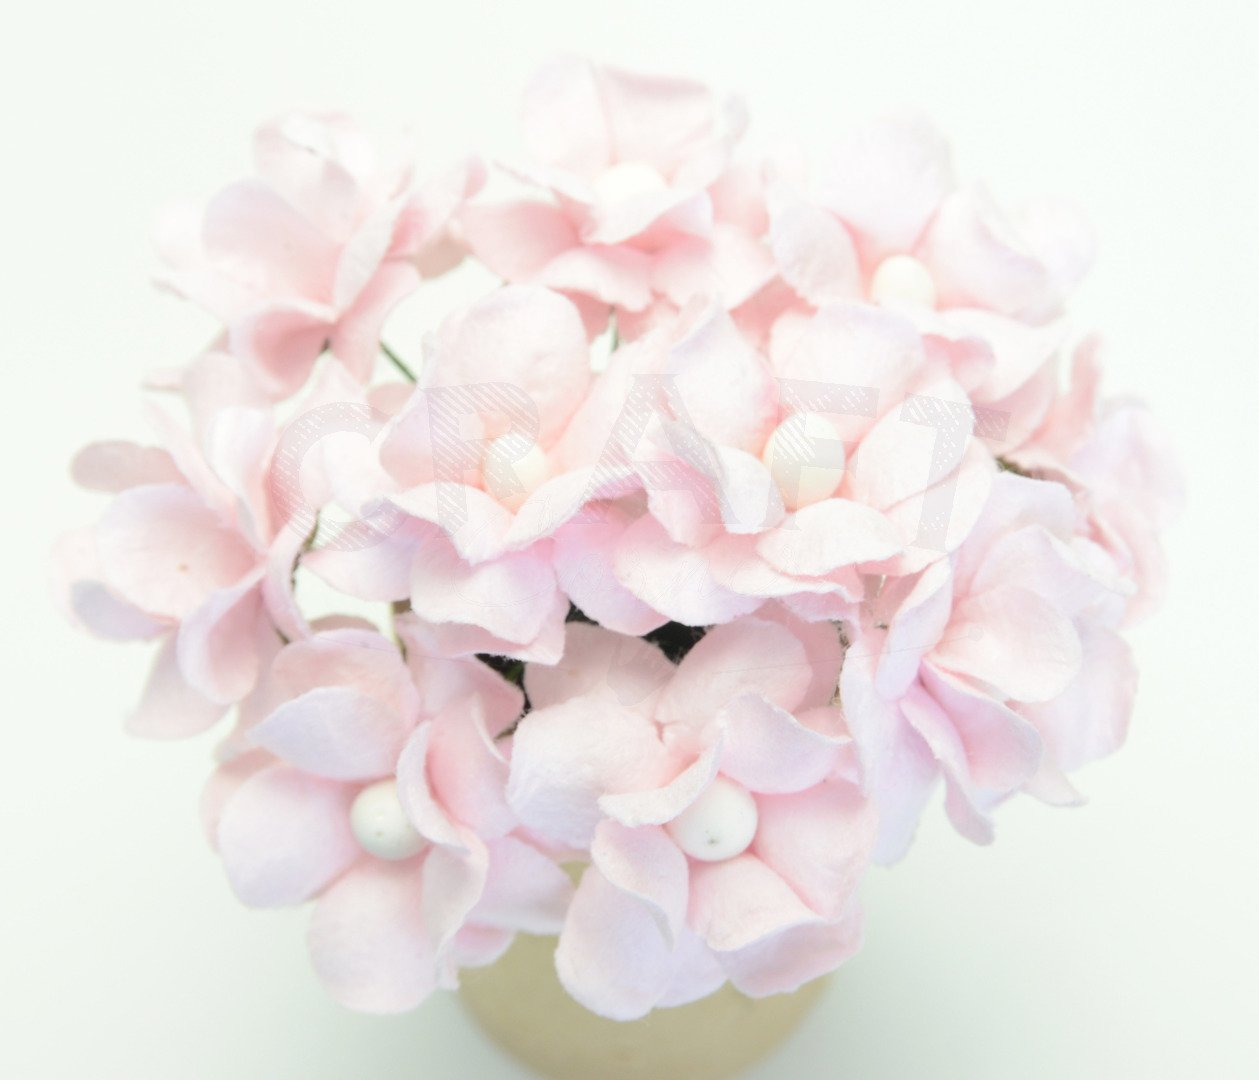 Filipinki pale pink flowers 10pcs kategorie tematyczne komunia filipinki pale pink flowers 10pcs mightylinksfo